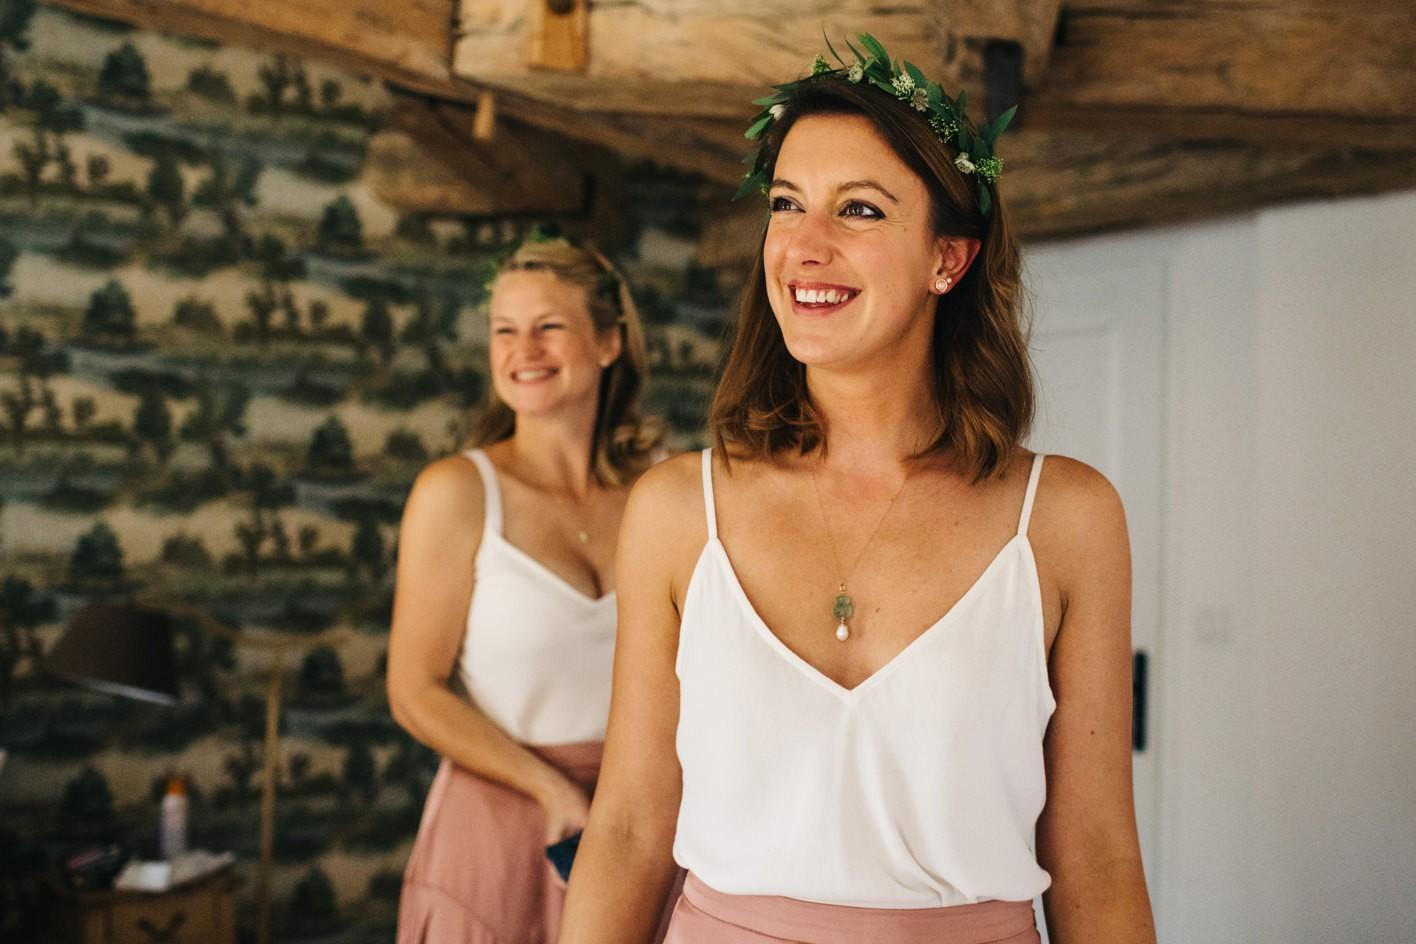 bridesmaids smile at bride